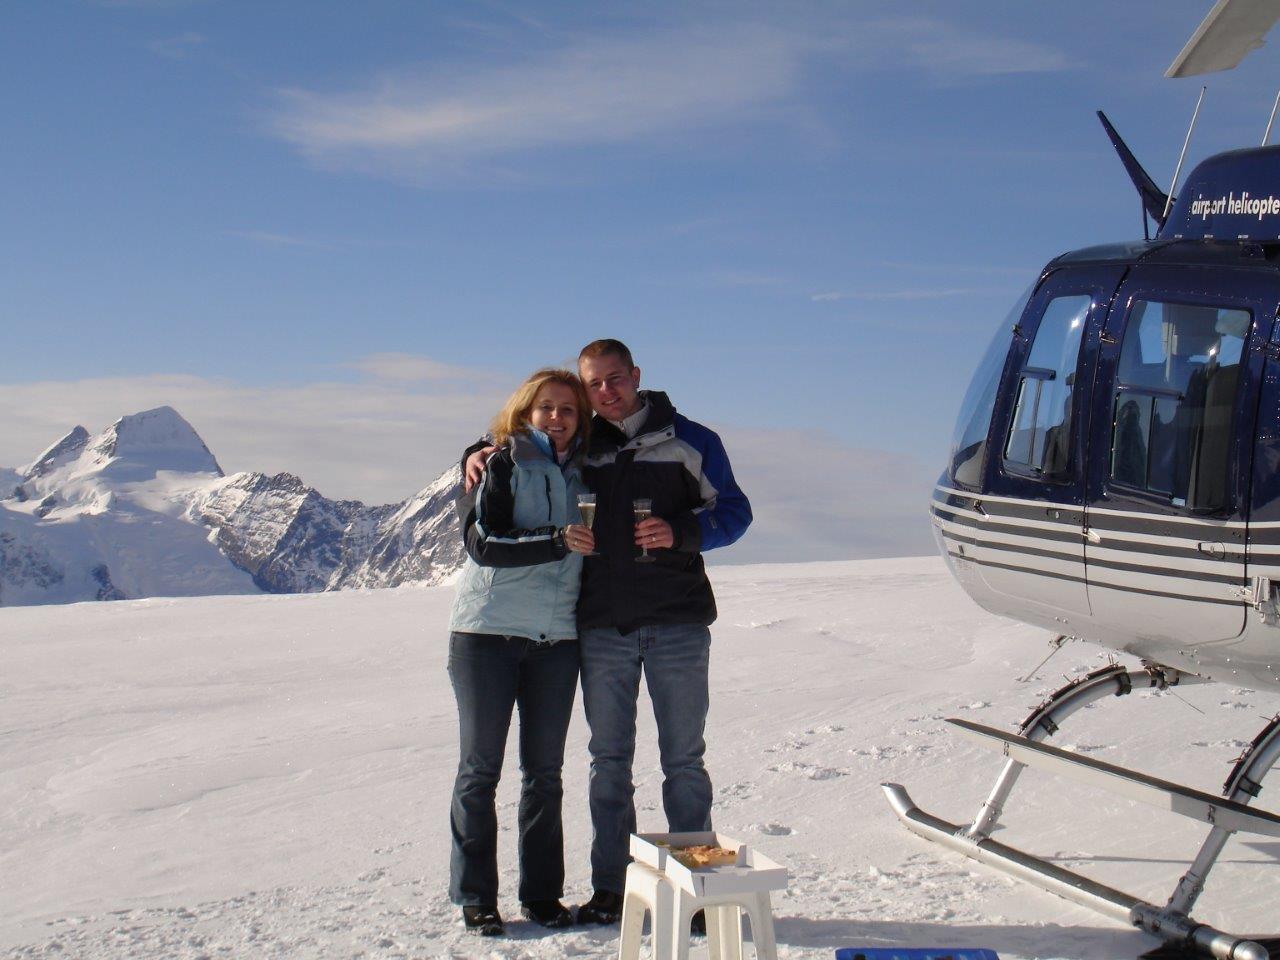 Gletscherflug mit Apéro Bernina Bergell